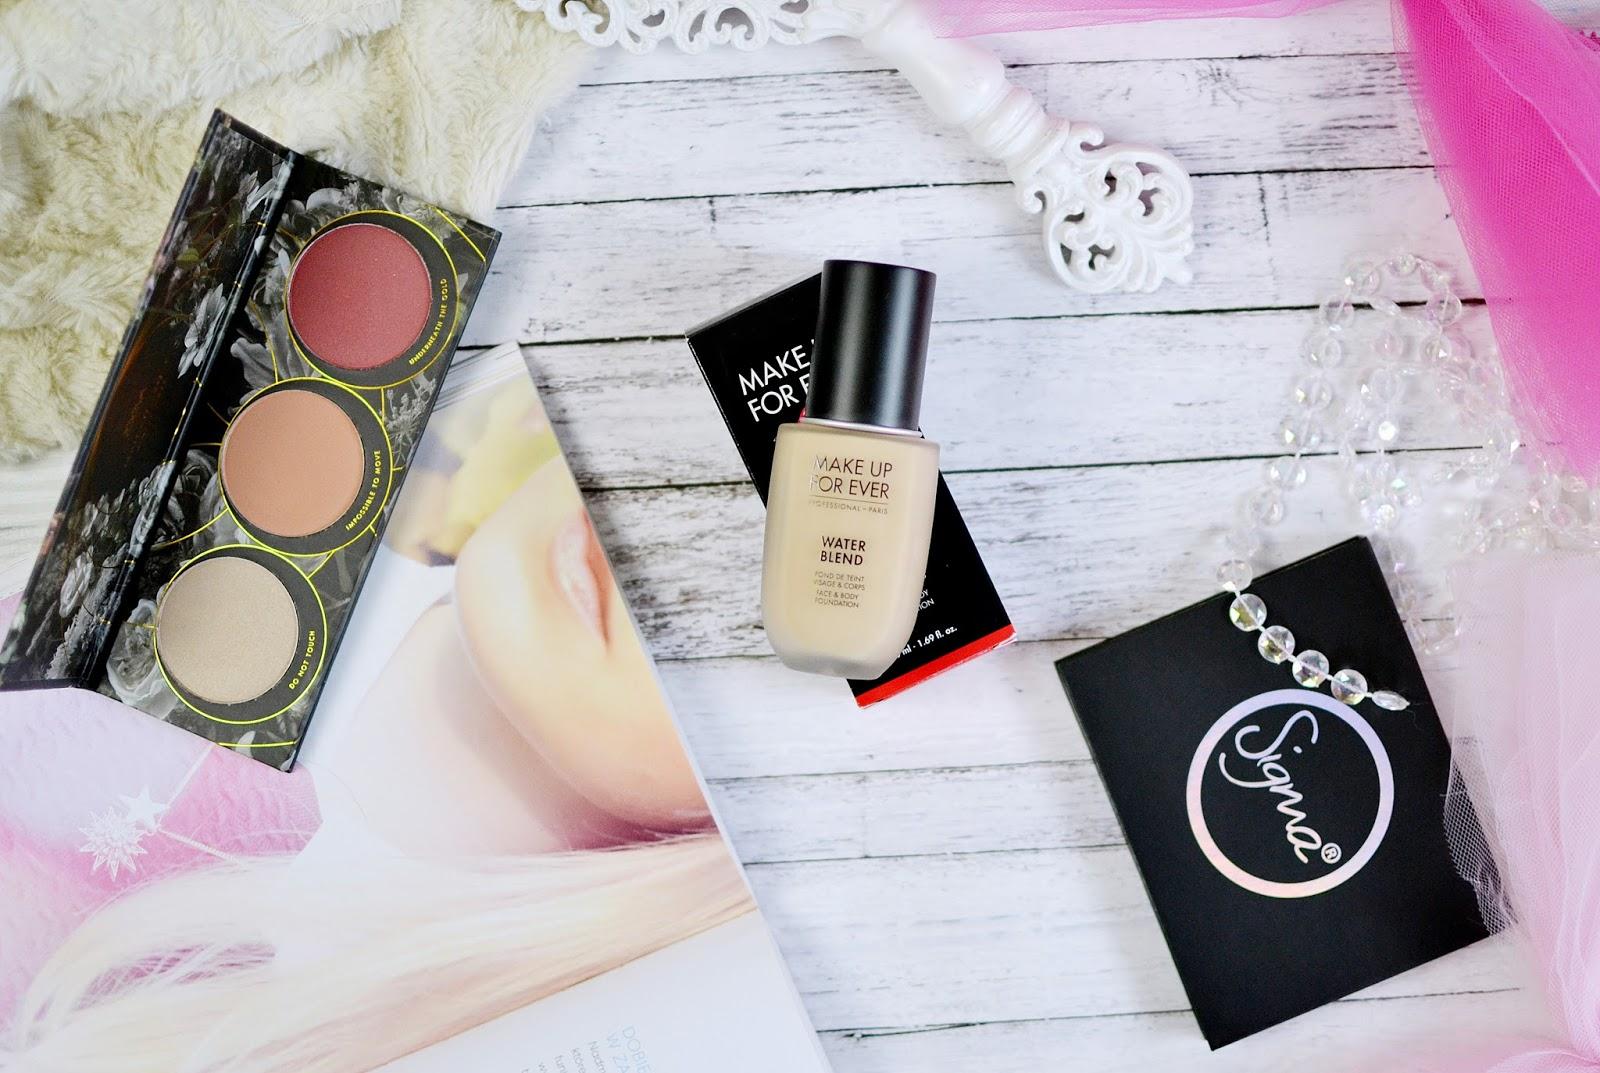 Recenzja podkładu Makeup Forever Water Blend